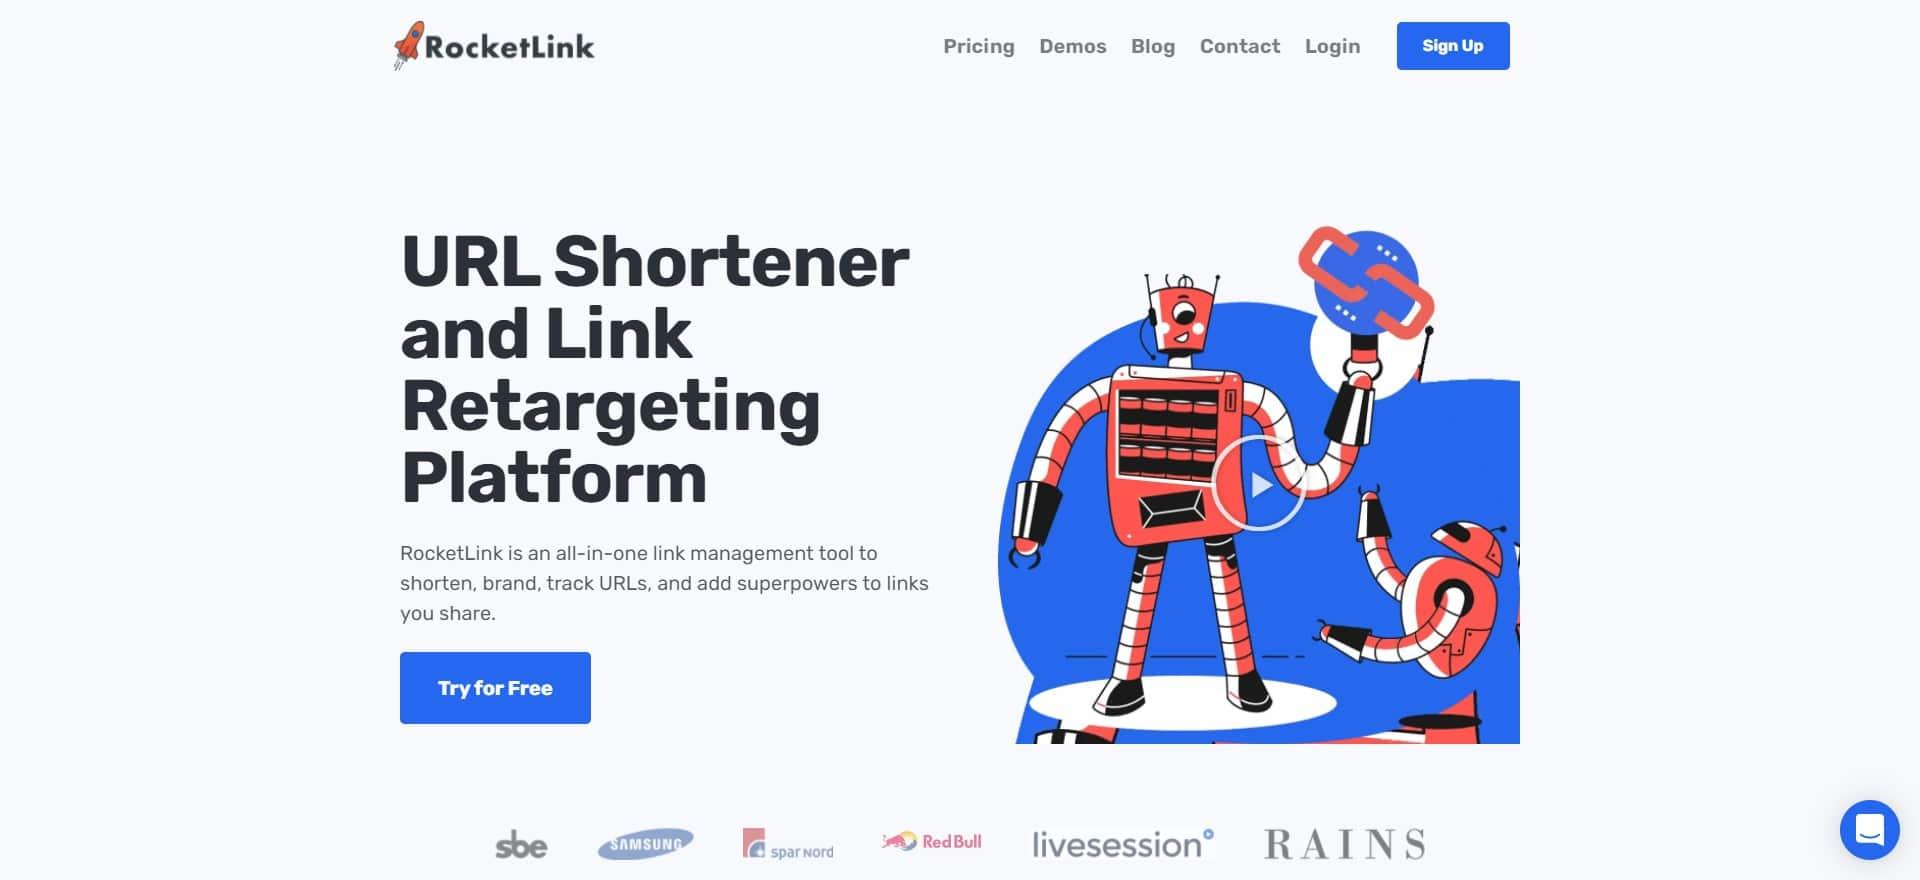 RocketLink URL Shortner